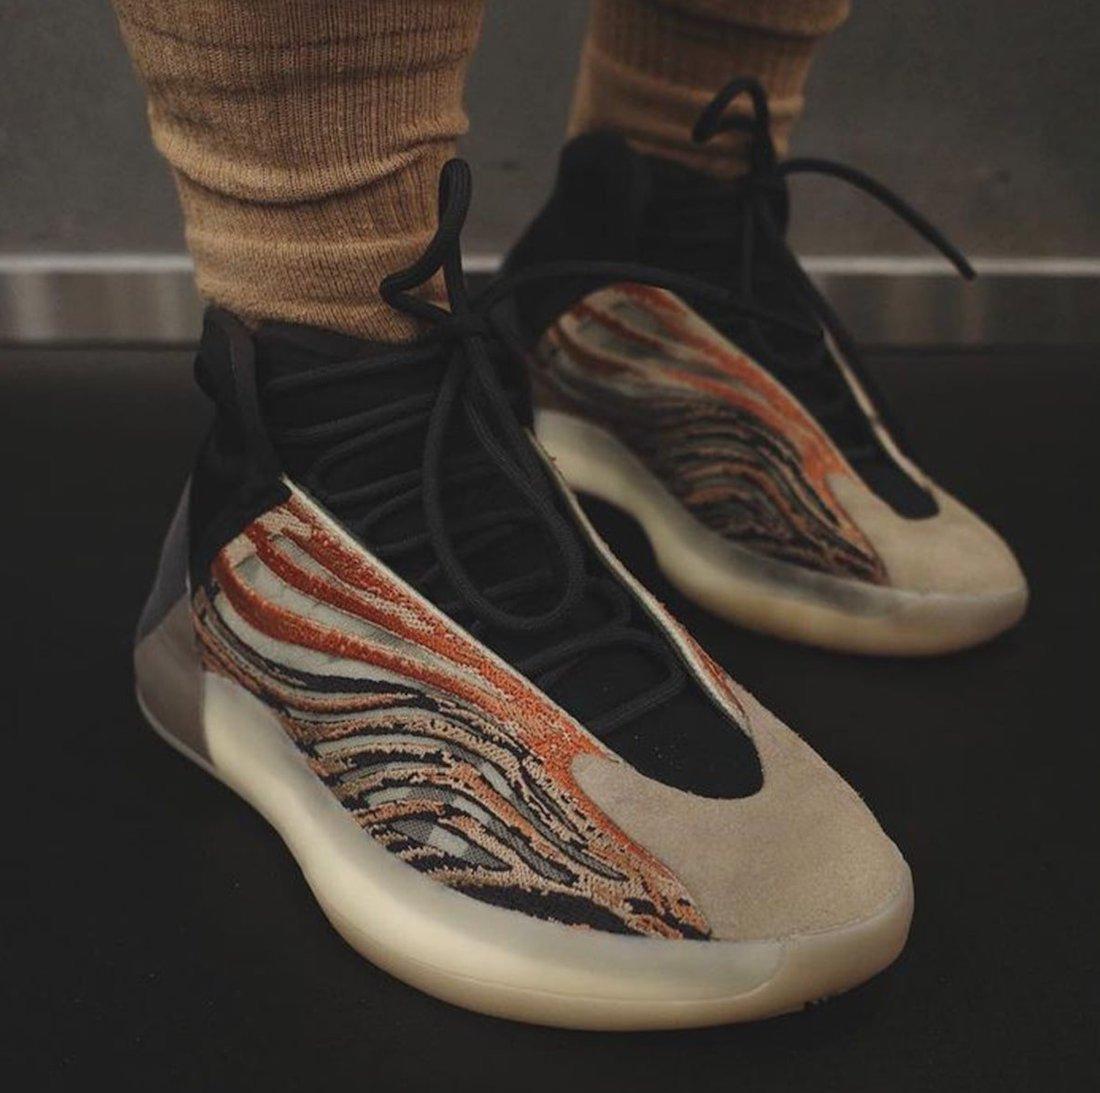 adidas Yeezy Quantum Flaora Release Date